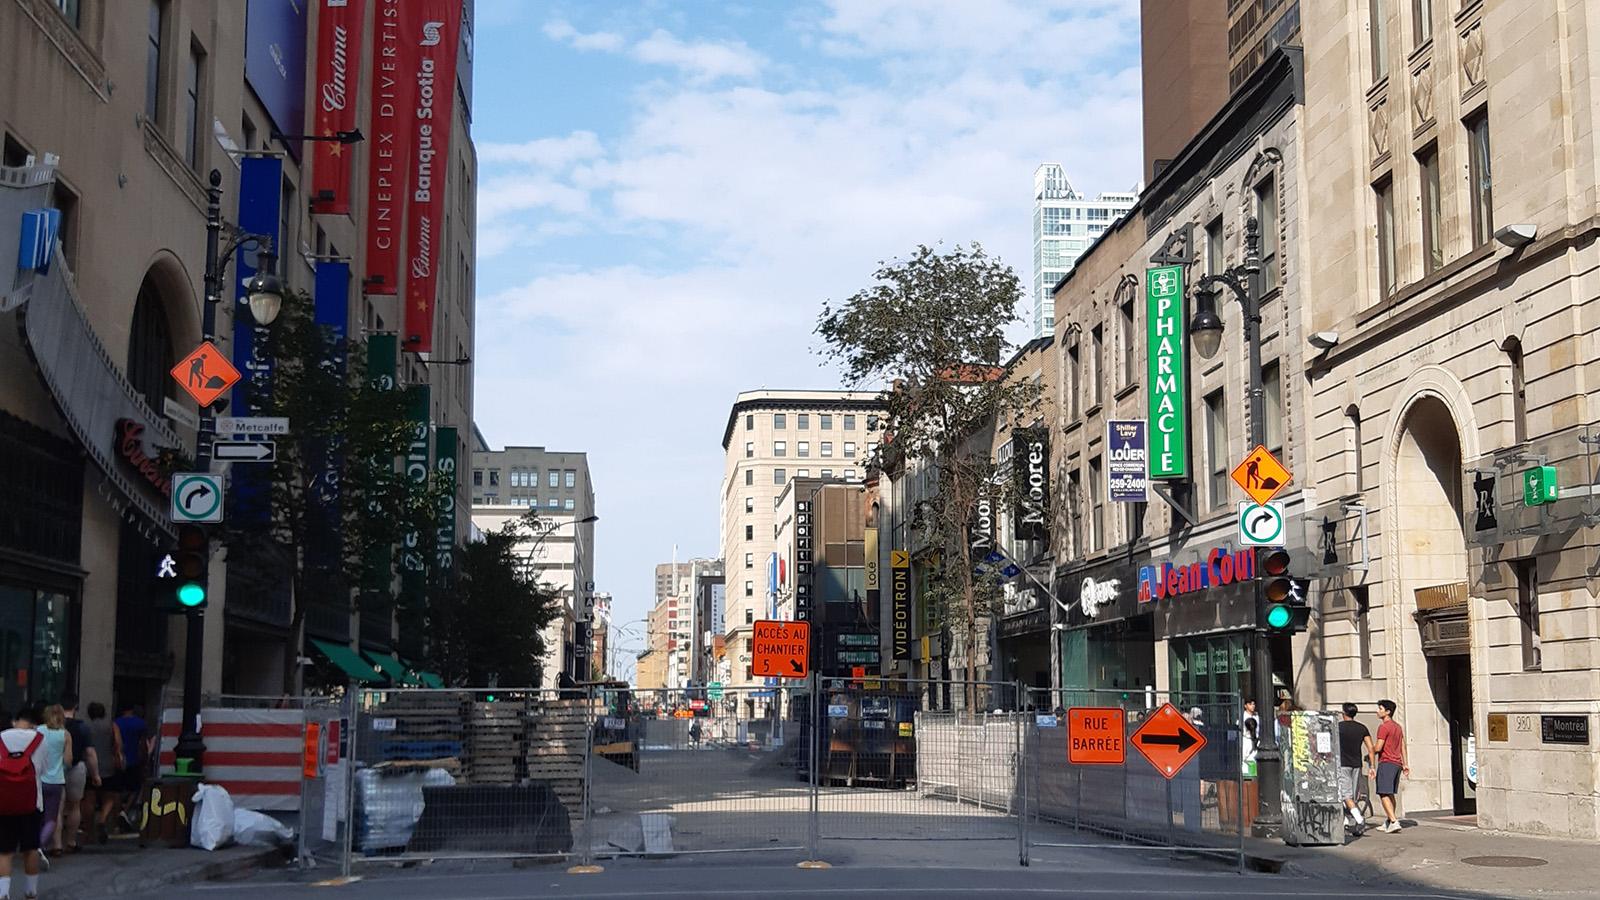 Montreal, Saint-Catherine St. and Metcalfe